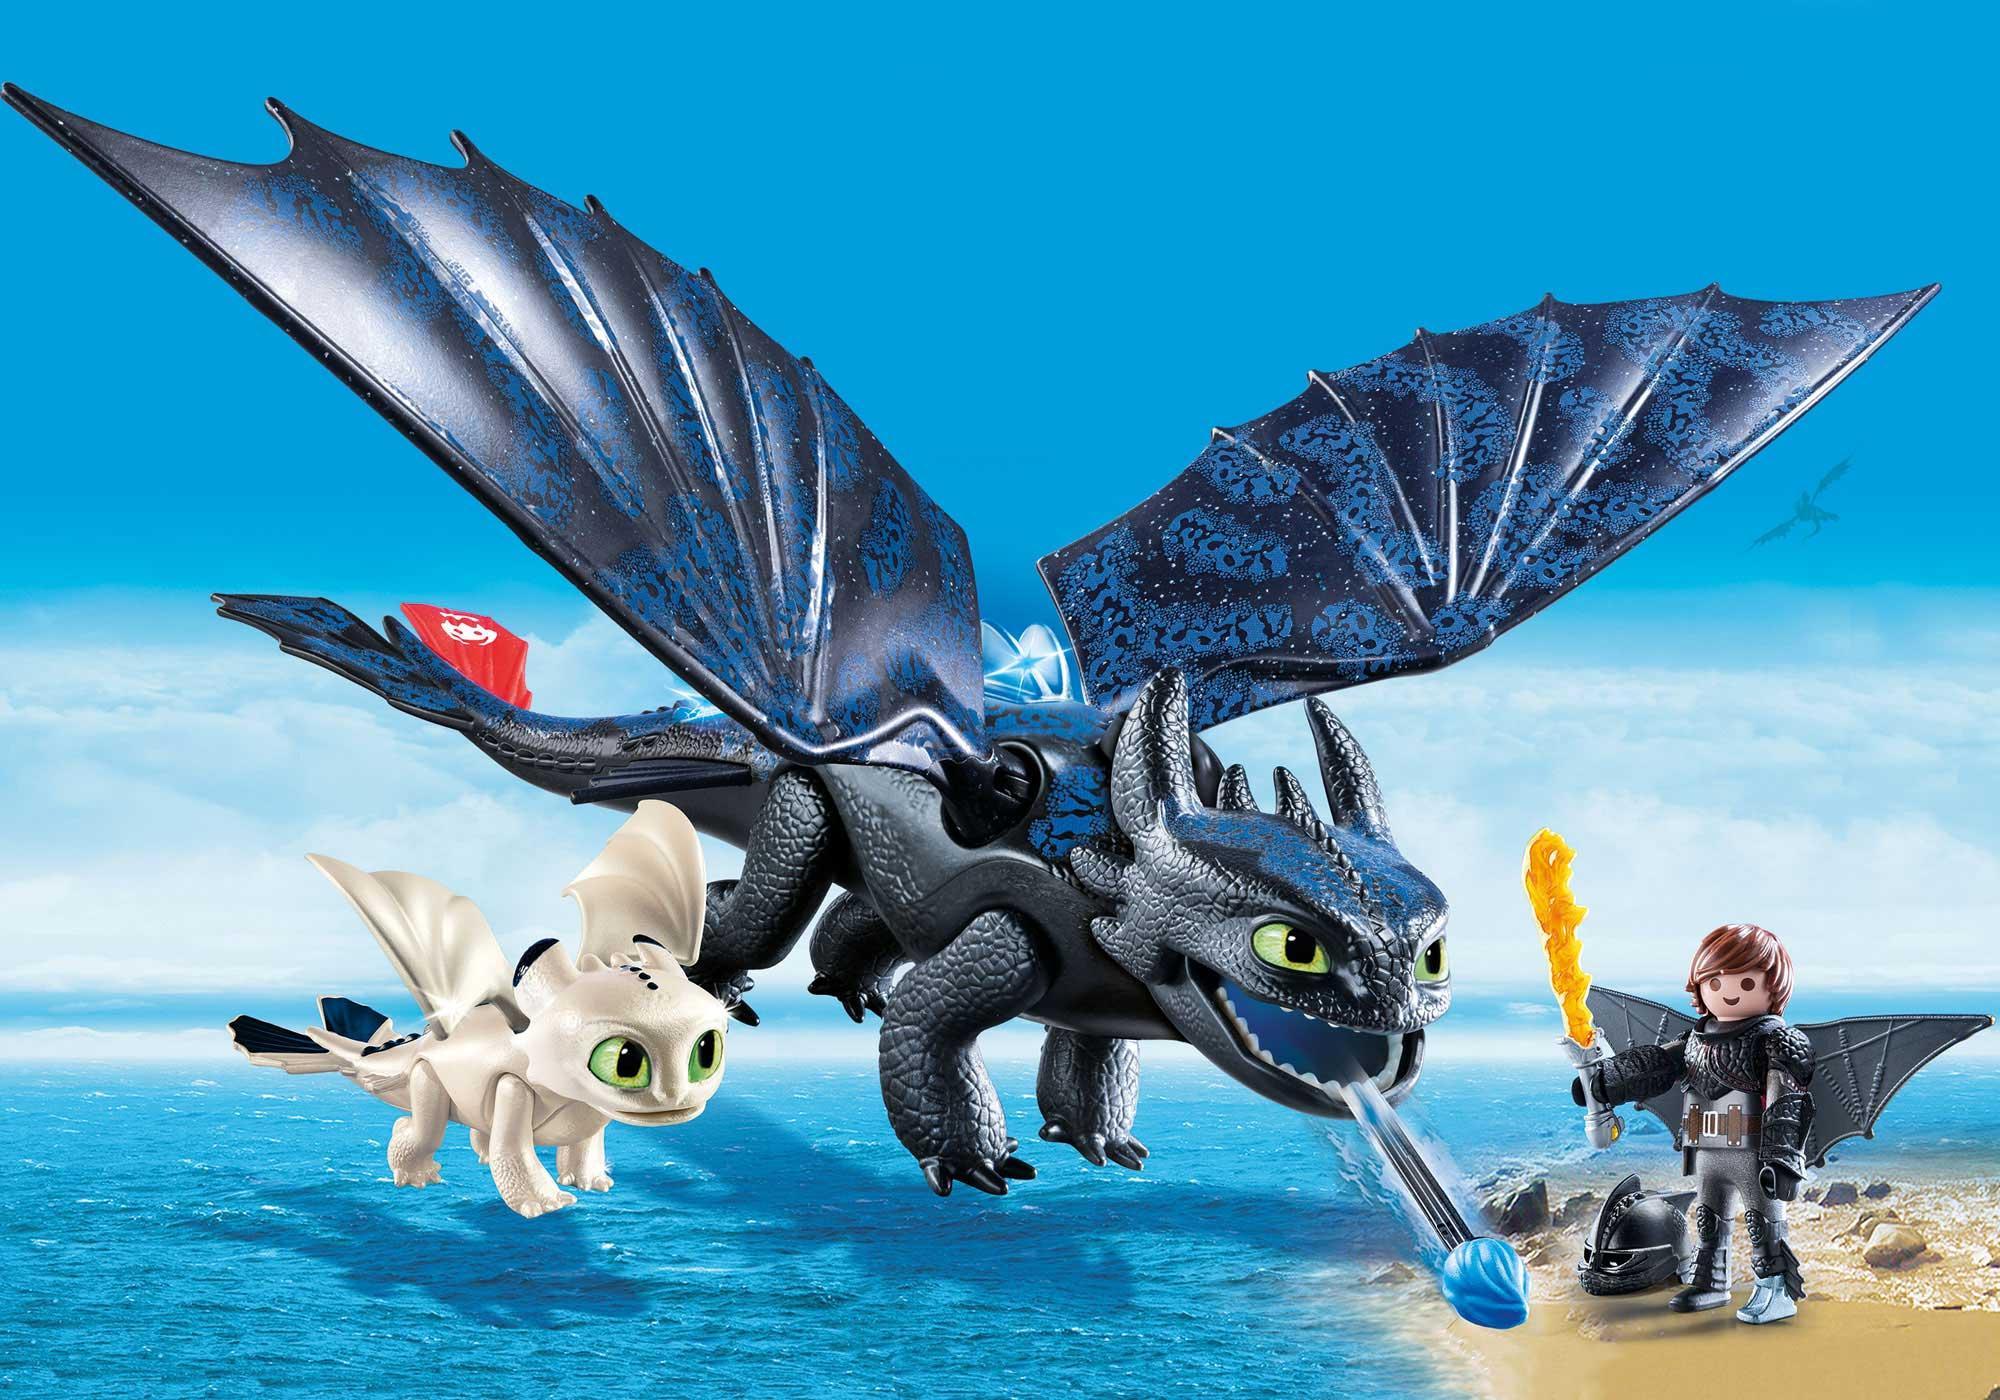 70037_product_detail/Hiccup e Sdentato con Baby Dragon